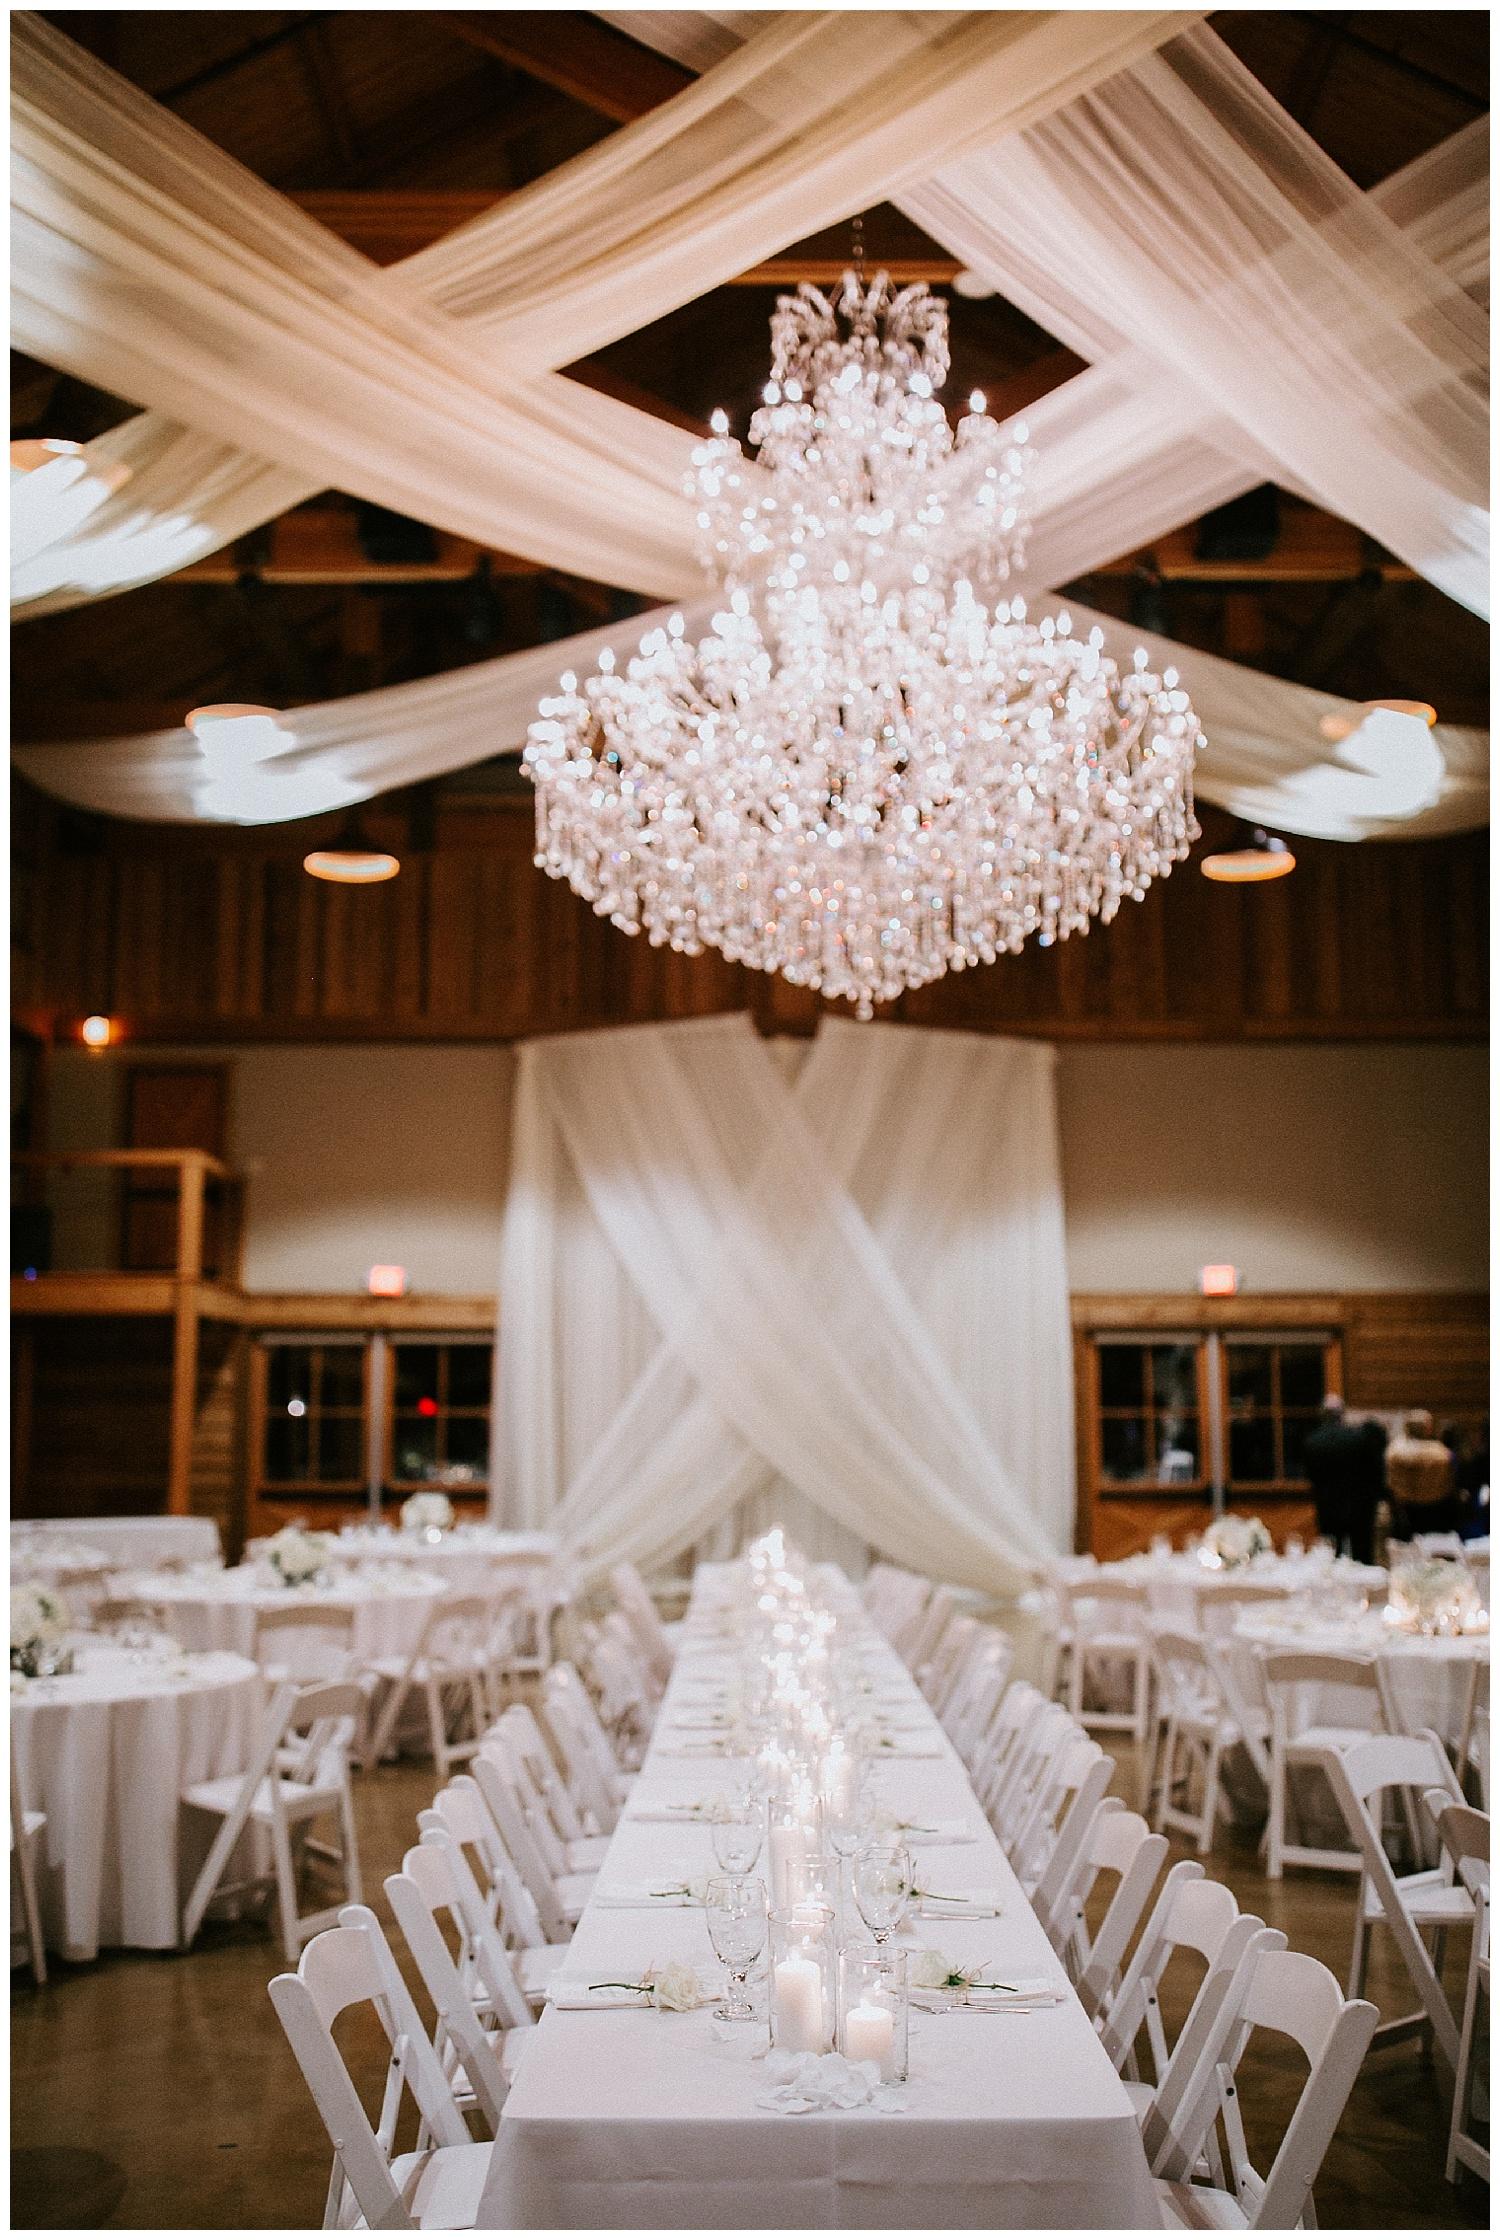 classy-wedding-sycamore_farms-nashville-tn2019-01-22_0071.jpg